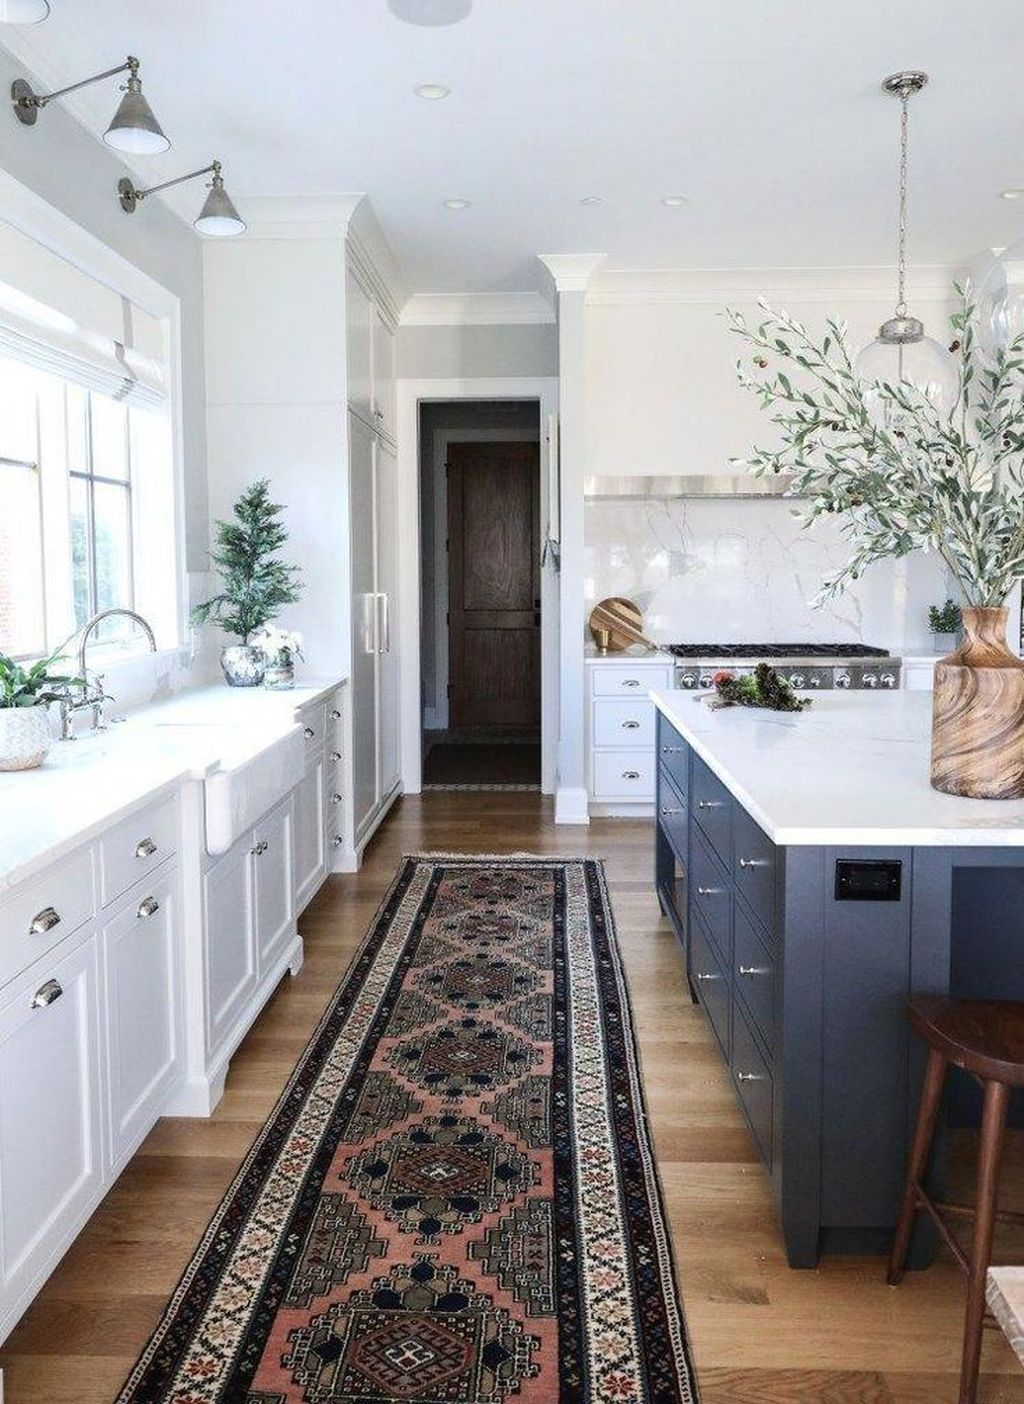 Stunning Farmhouse Interior Design Ideas To Realize Your Dreams 23